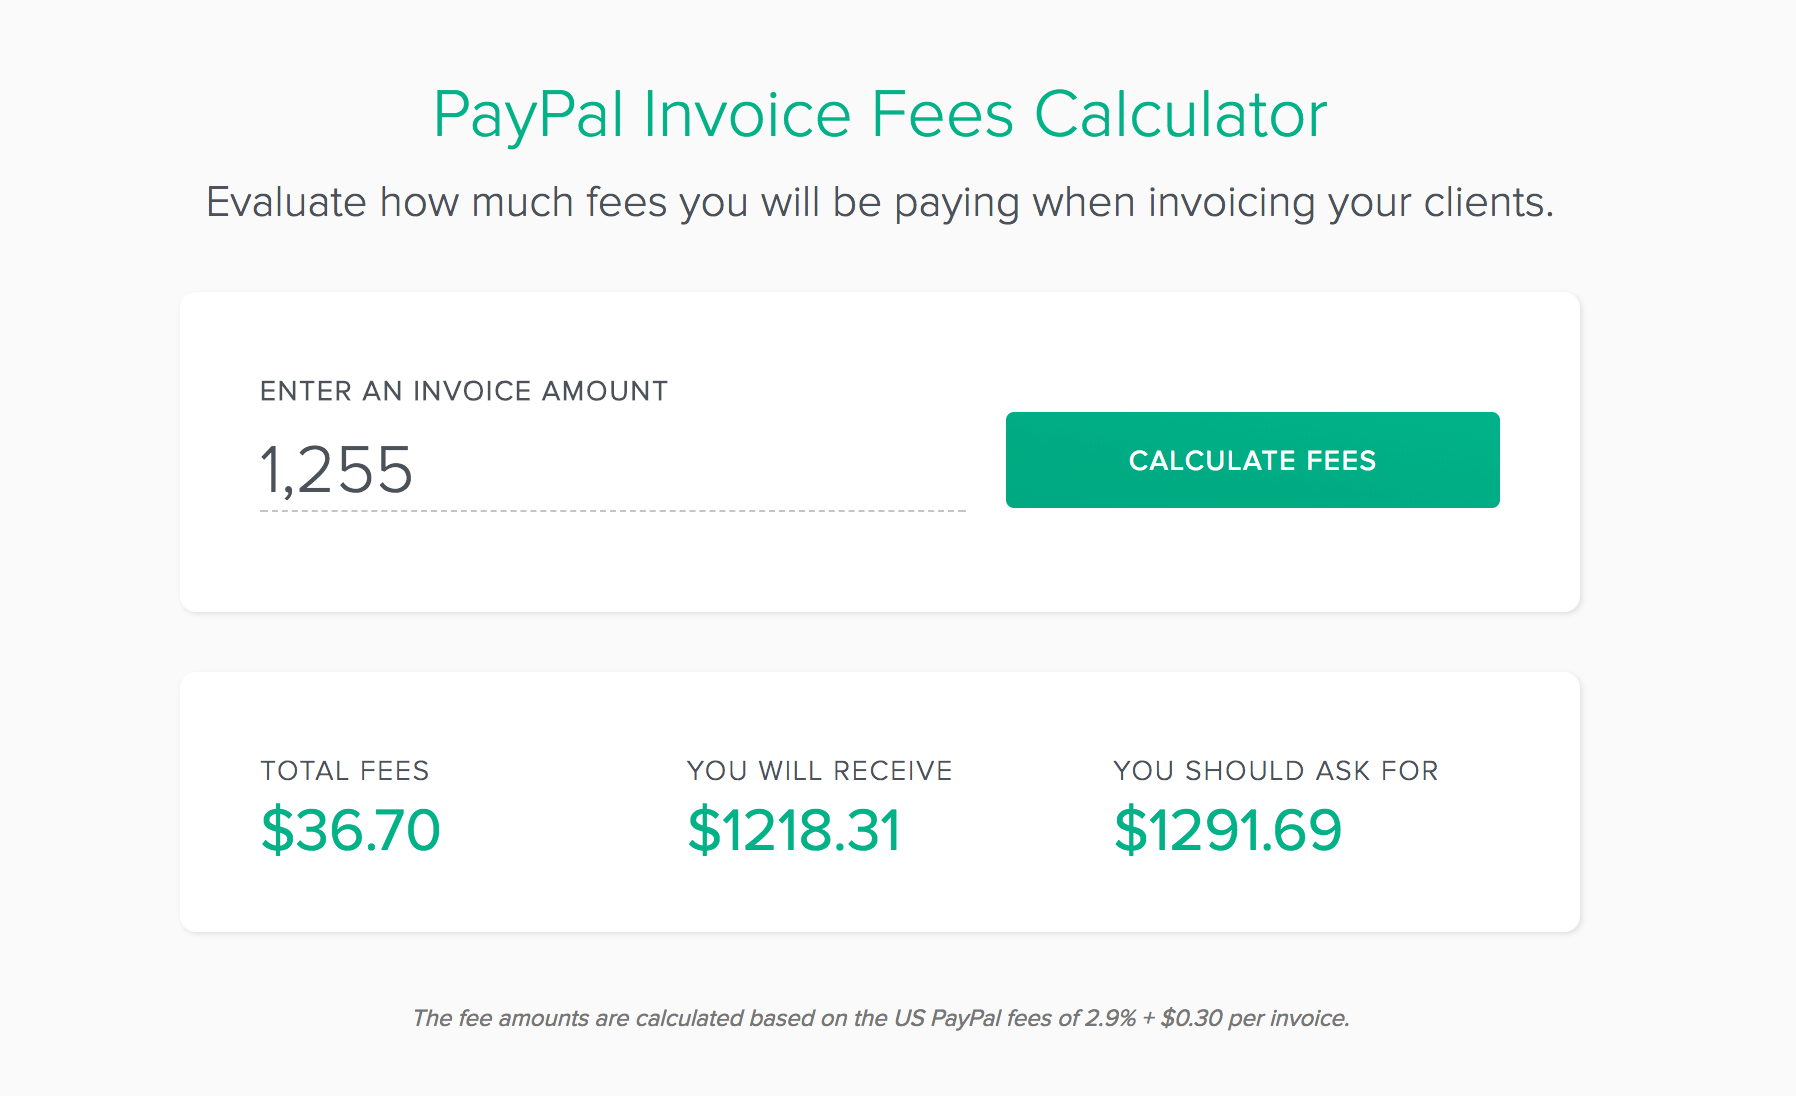 PauPal Invoice Fees Calculator